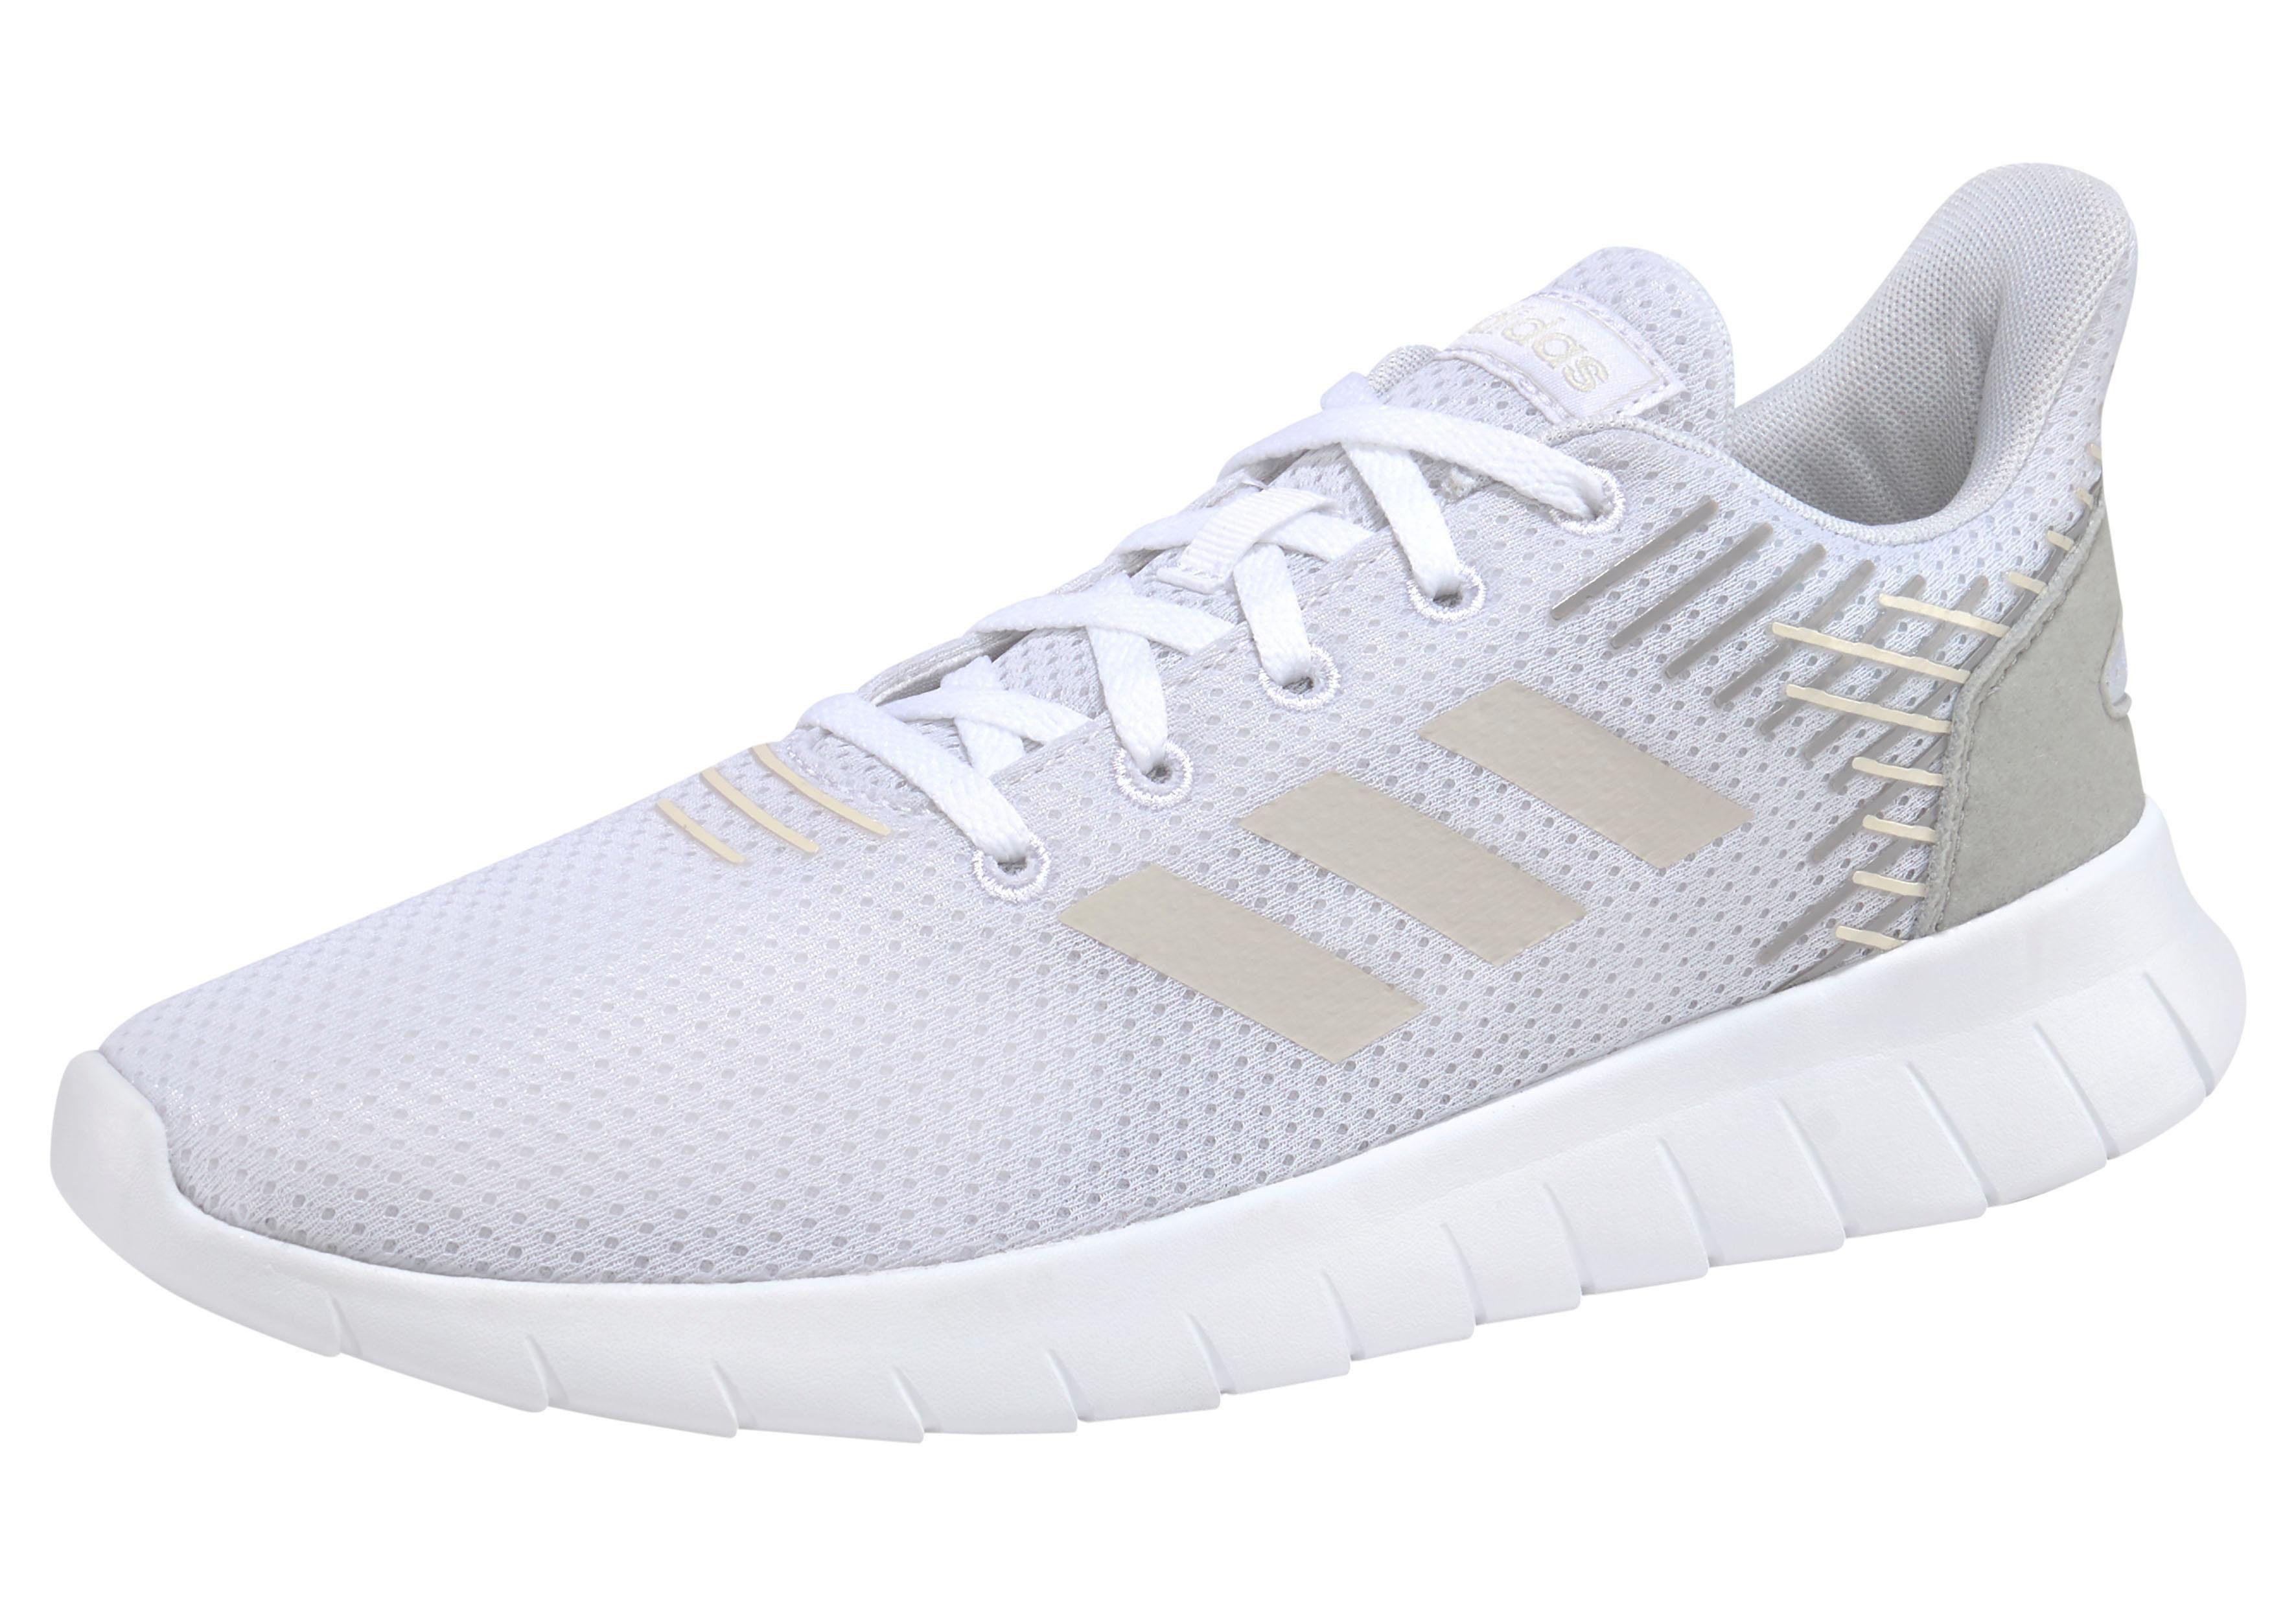 »asweerun« Meshobermaterial Online Adidas SneakerAtmungsaktives KaufenOtto uJlK3F5T1c